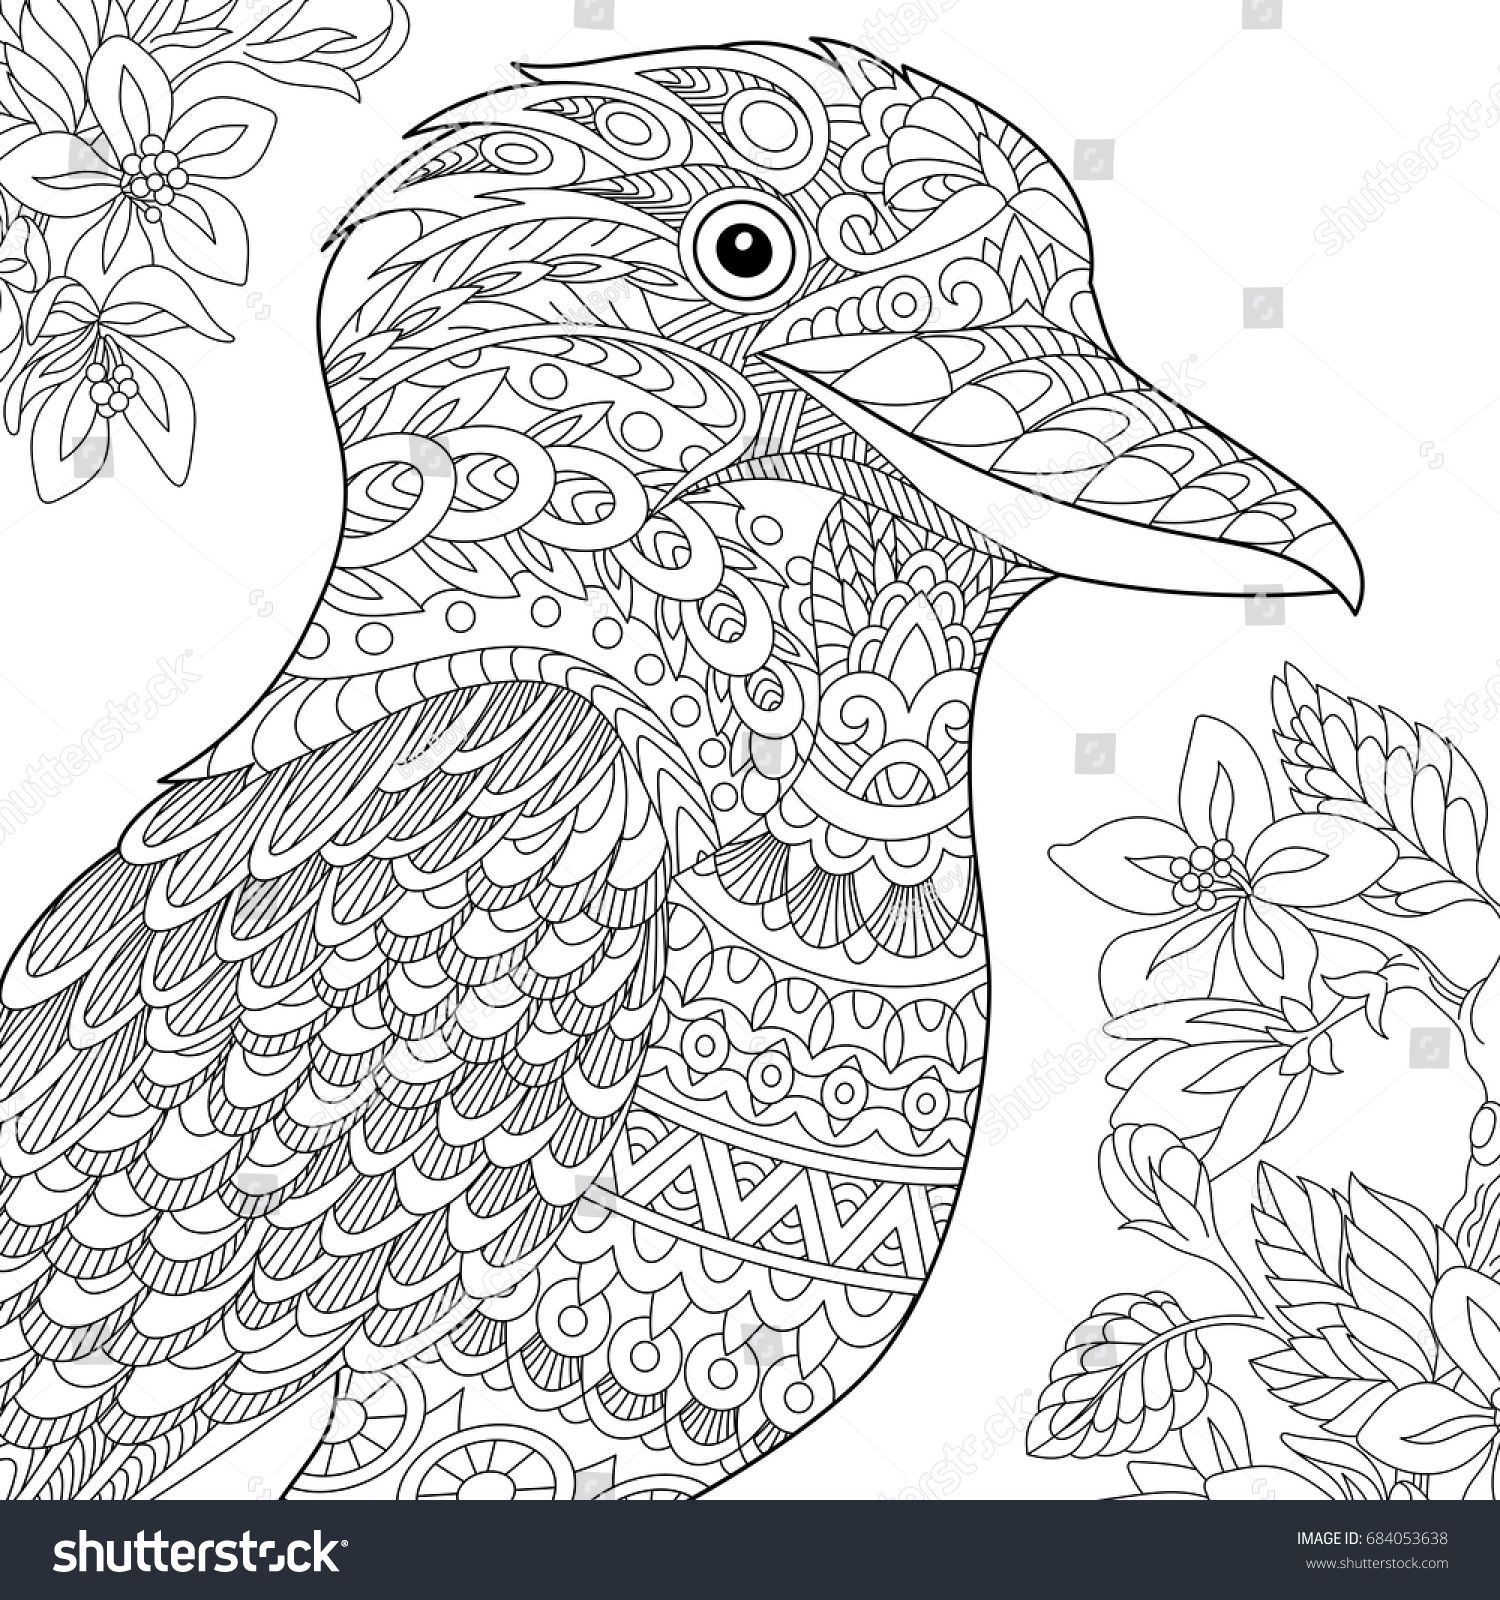 Coloring Page Australian Kookaburra Bird Freehand Sketch Drawing